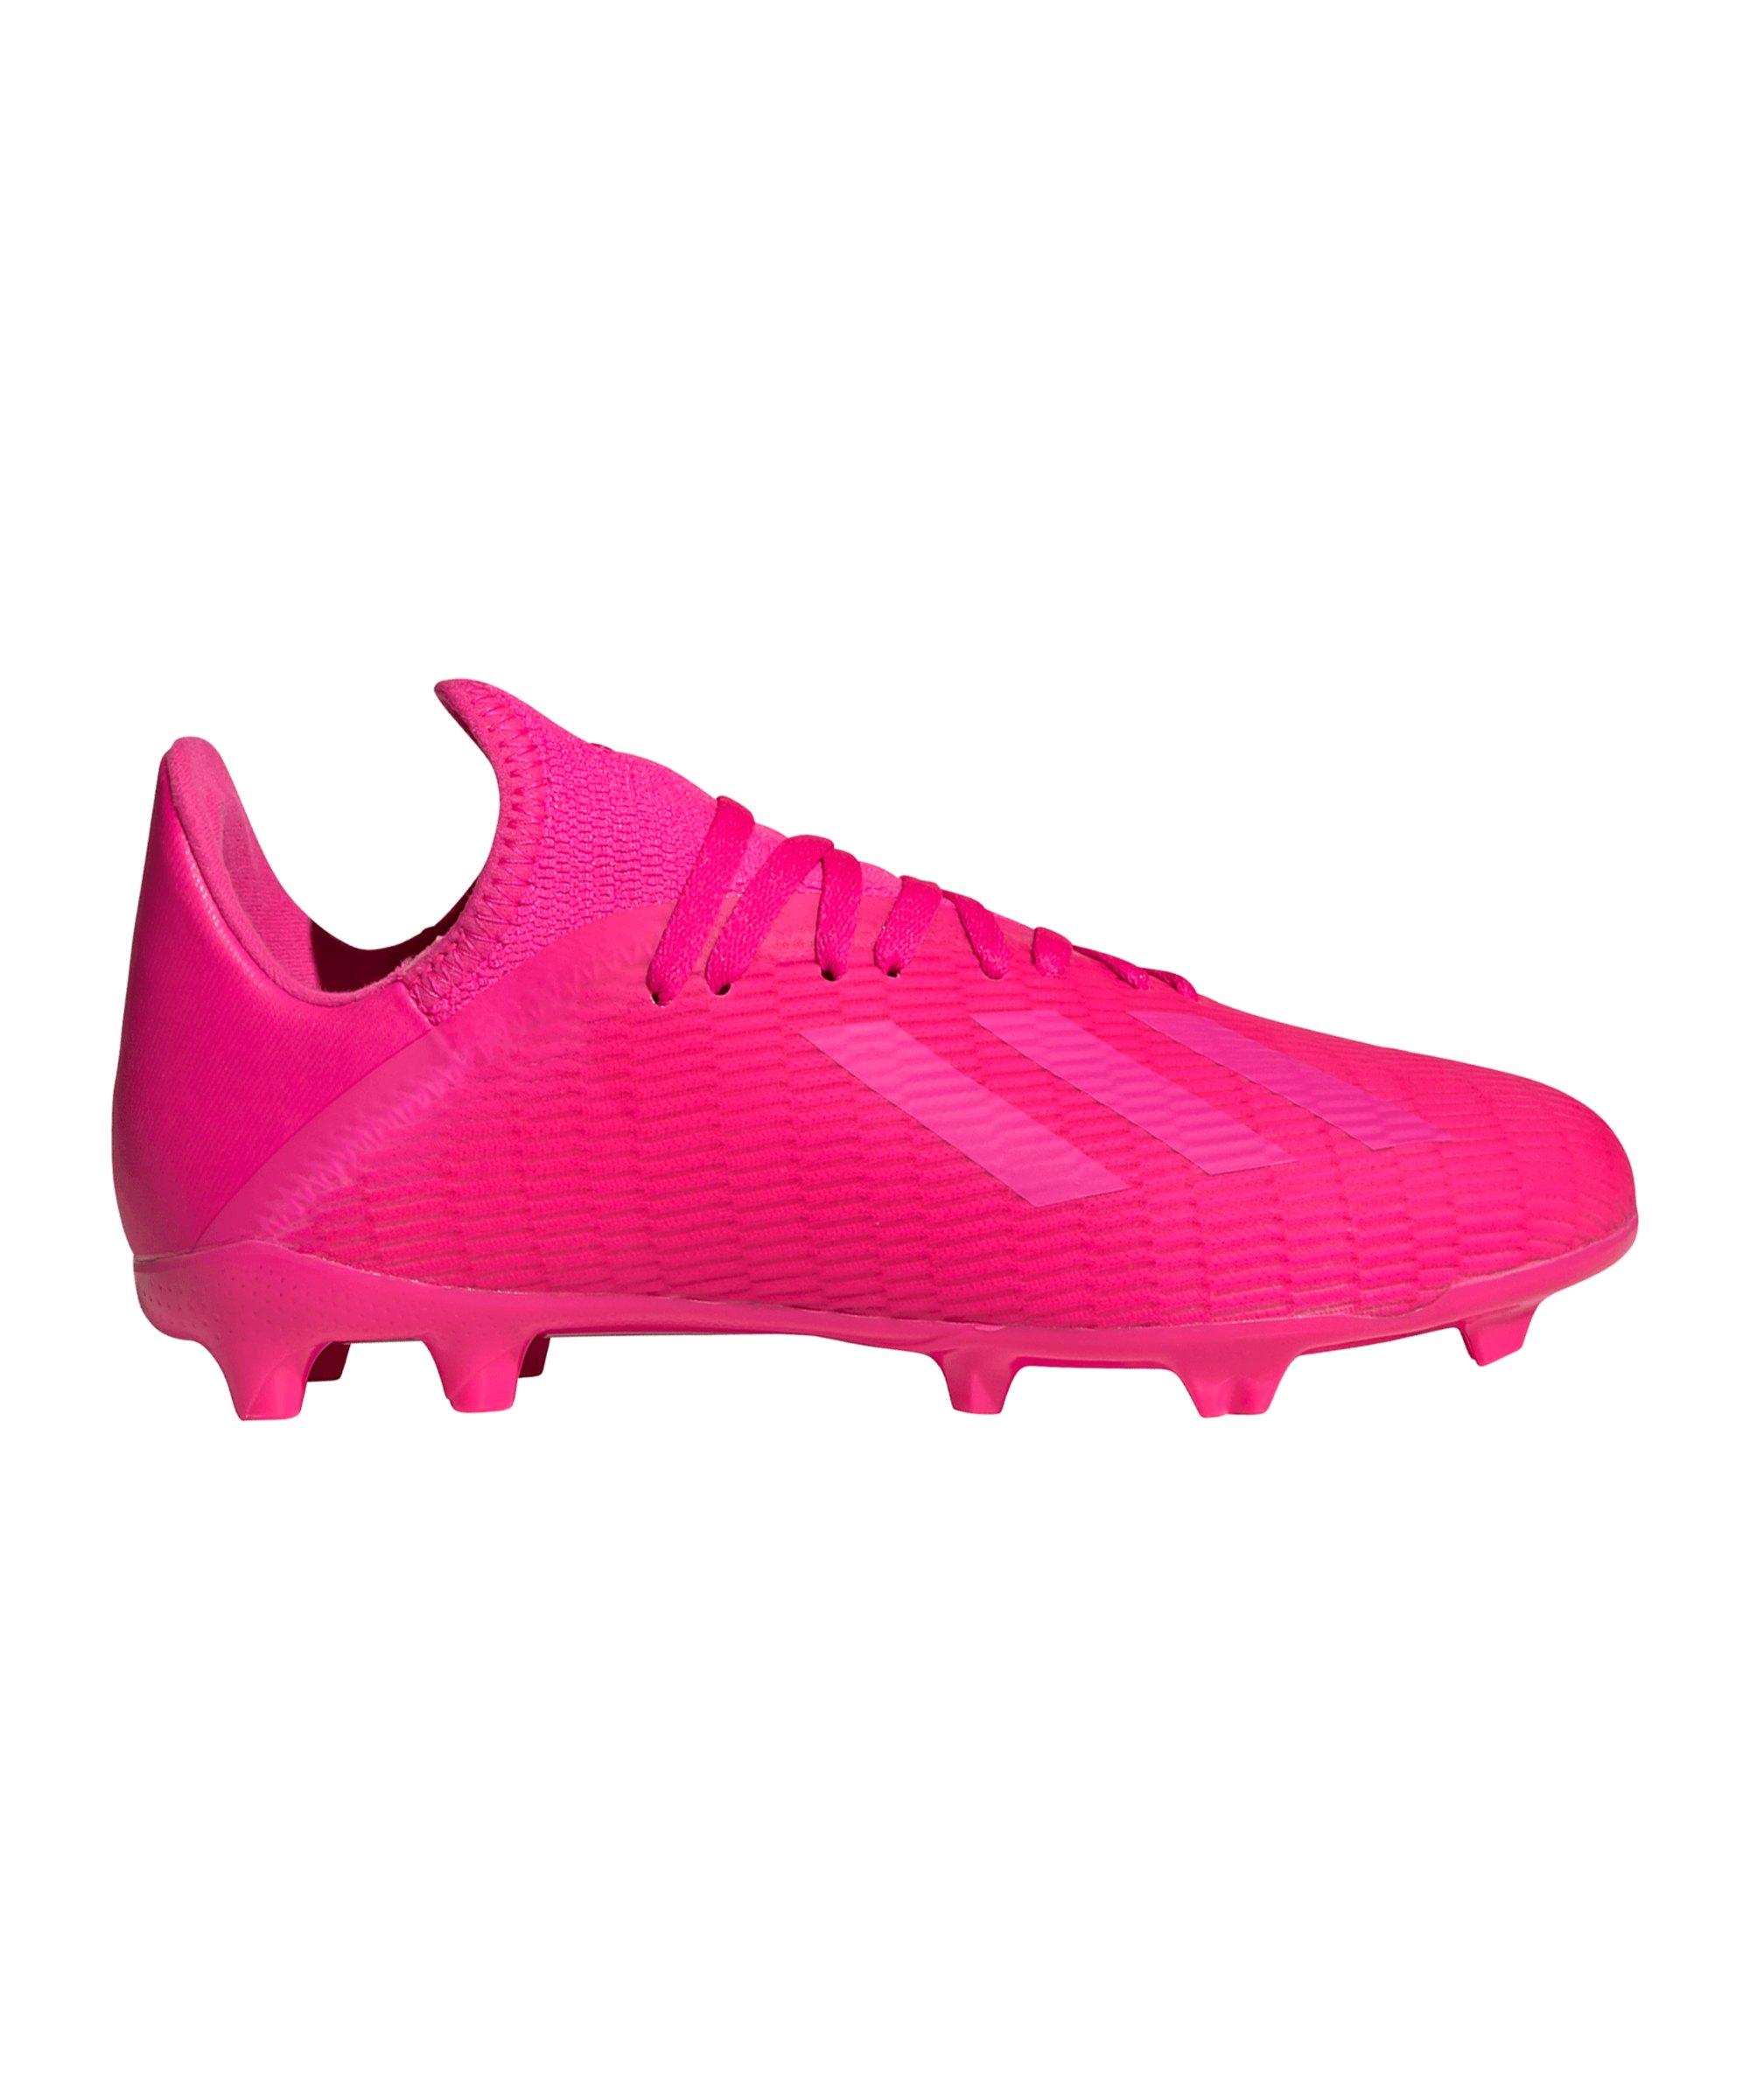 adidas X 19.3 FG J Kids Pink - pink